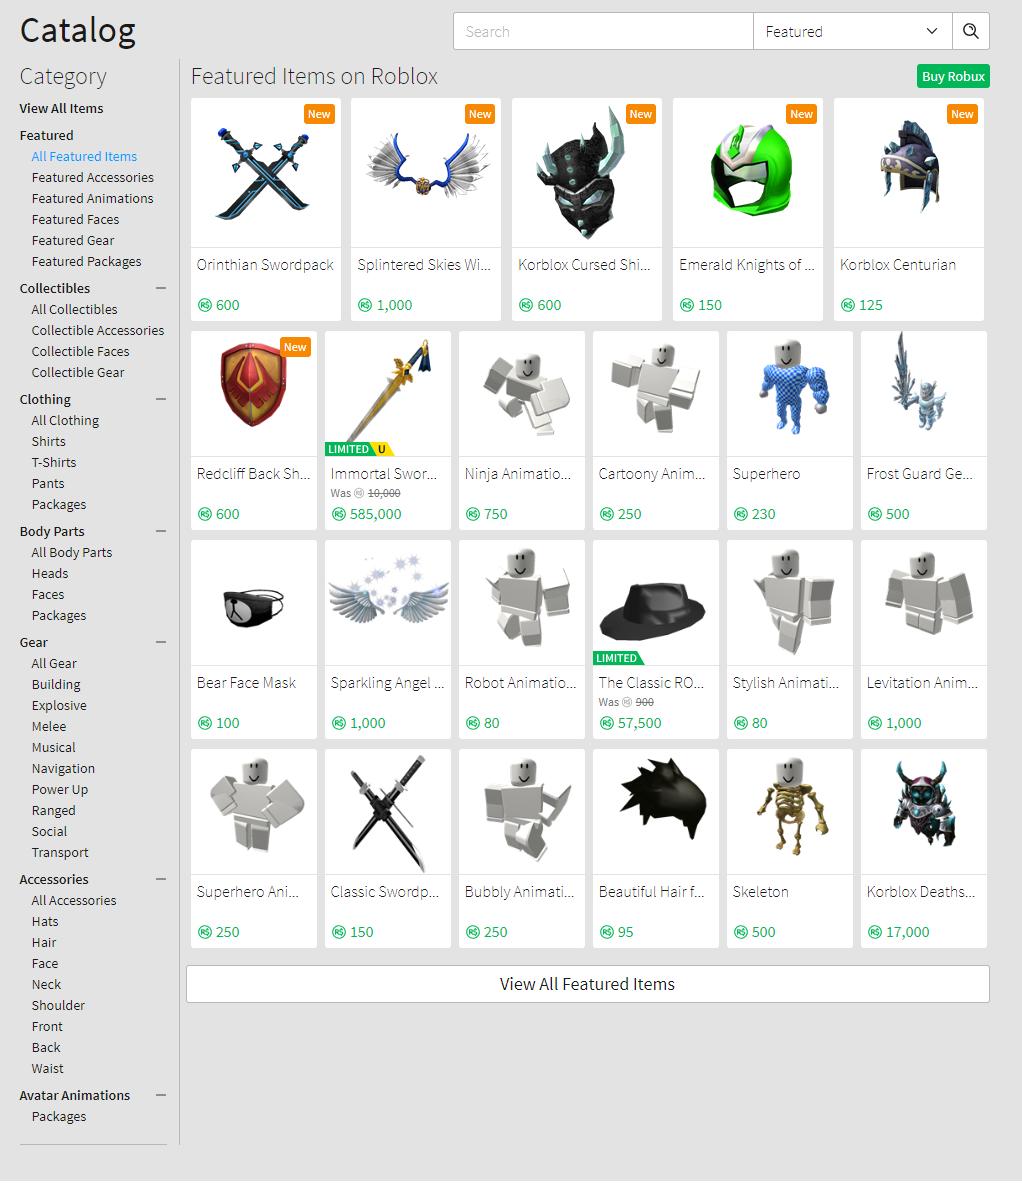 Tutorial:How to use the catalog   Roblox Wikia   FANDOM ...